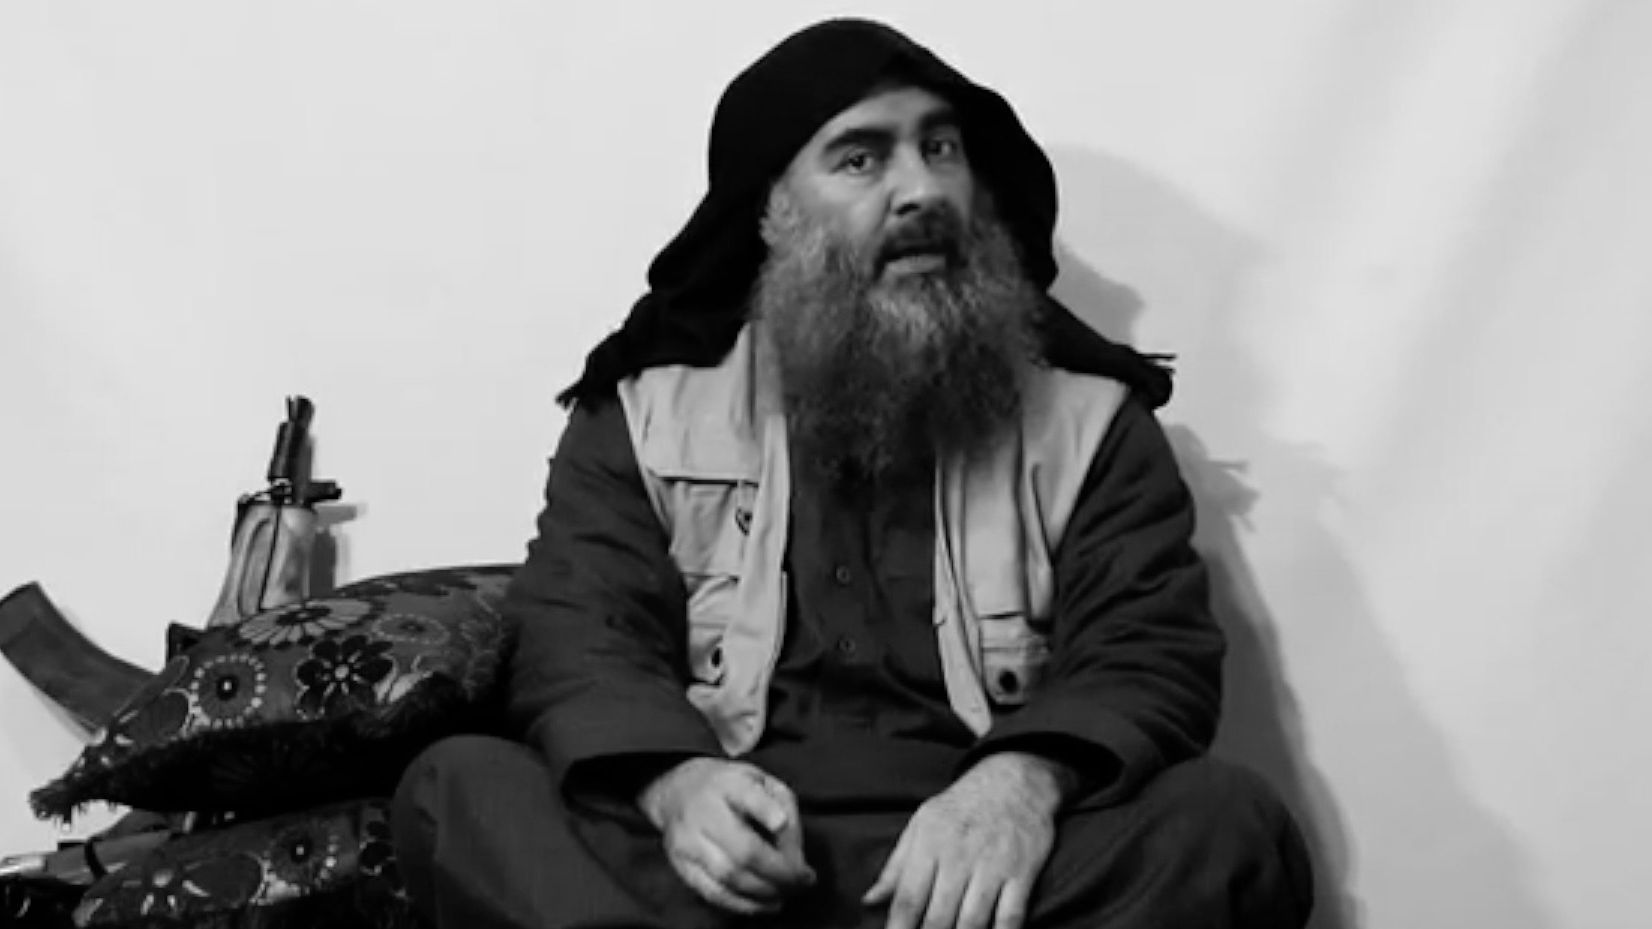 Der getötete IS-Anführer Abu Bakr al-Bagdadi